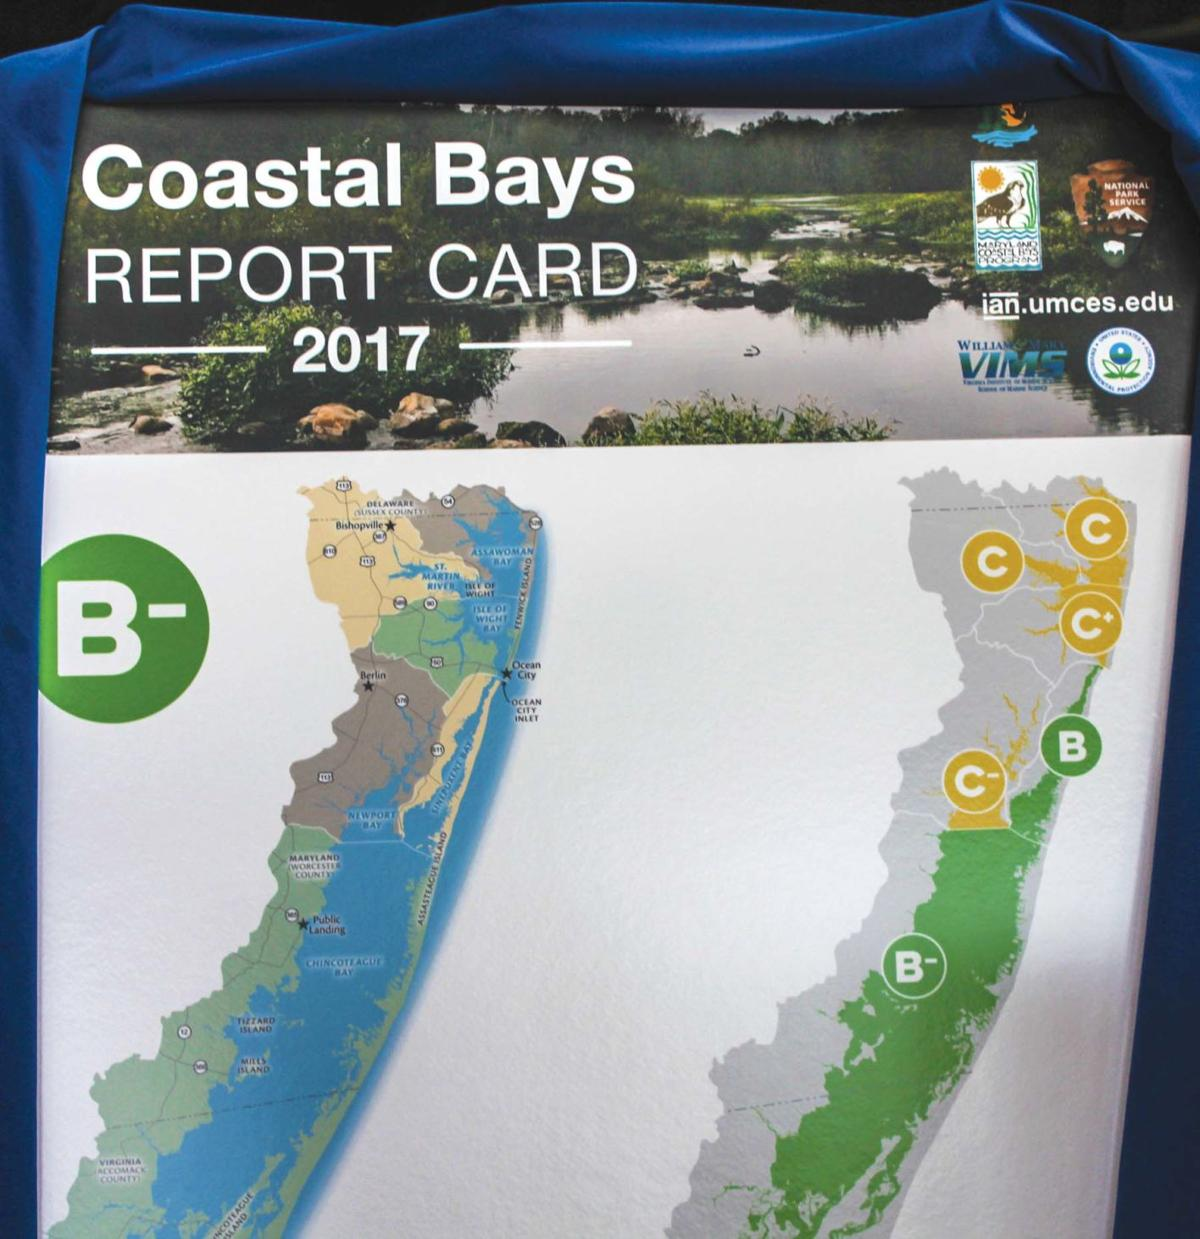 Coastal Bays report card